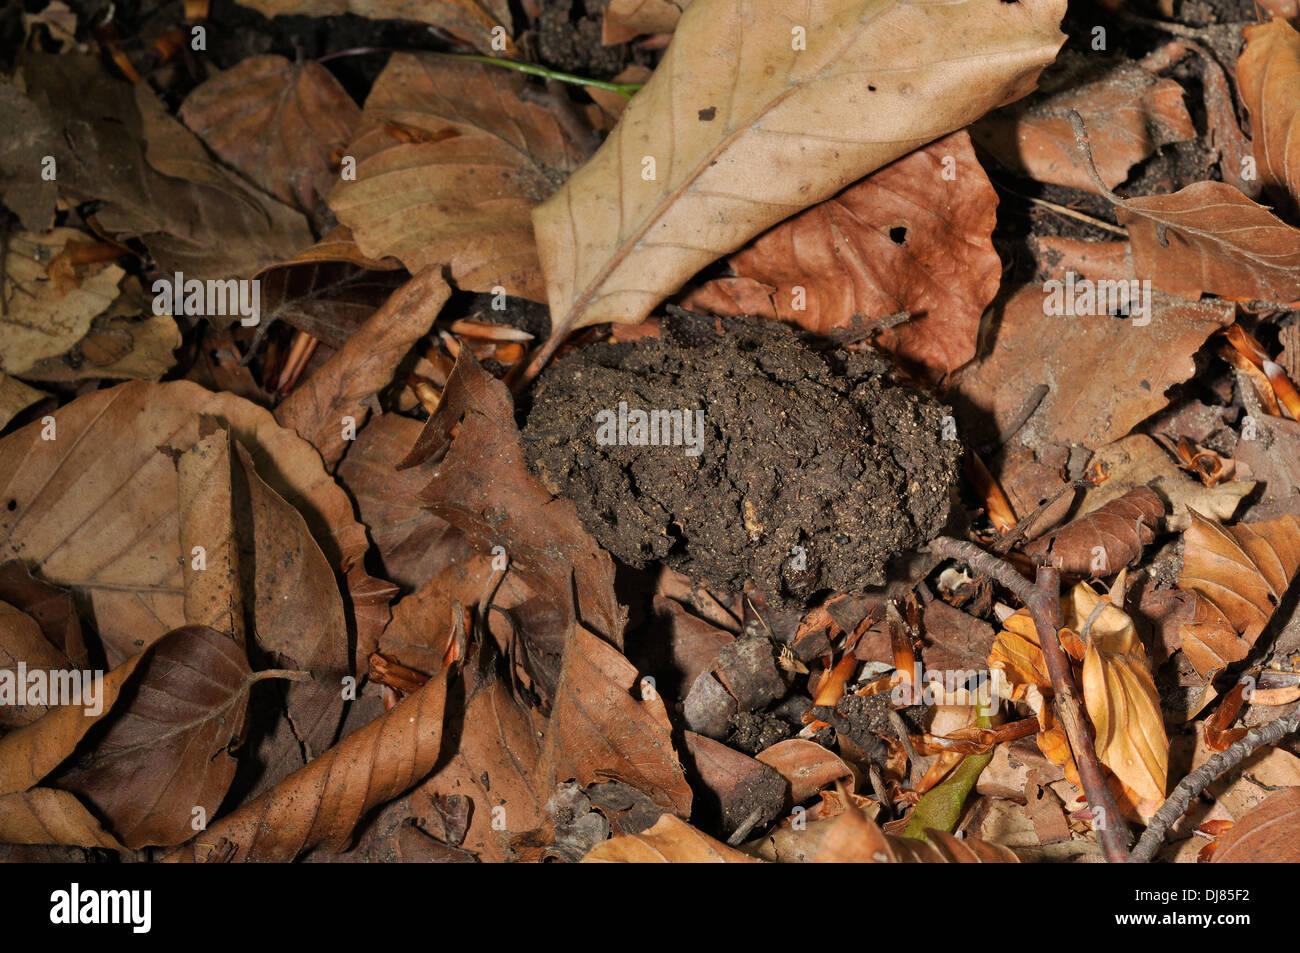 Excrements of Brown bear Ursus actor marsicanus, Abruzzo National Park, Pescasseroli, Abruzzo, Italy - Stock Image